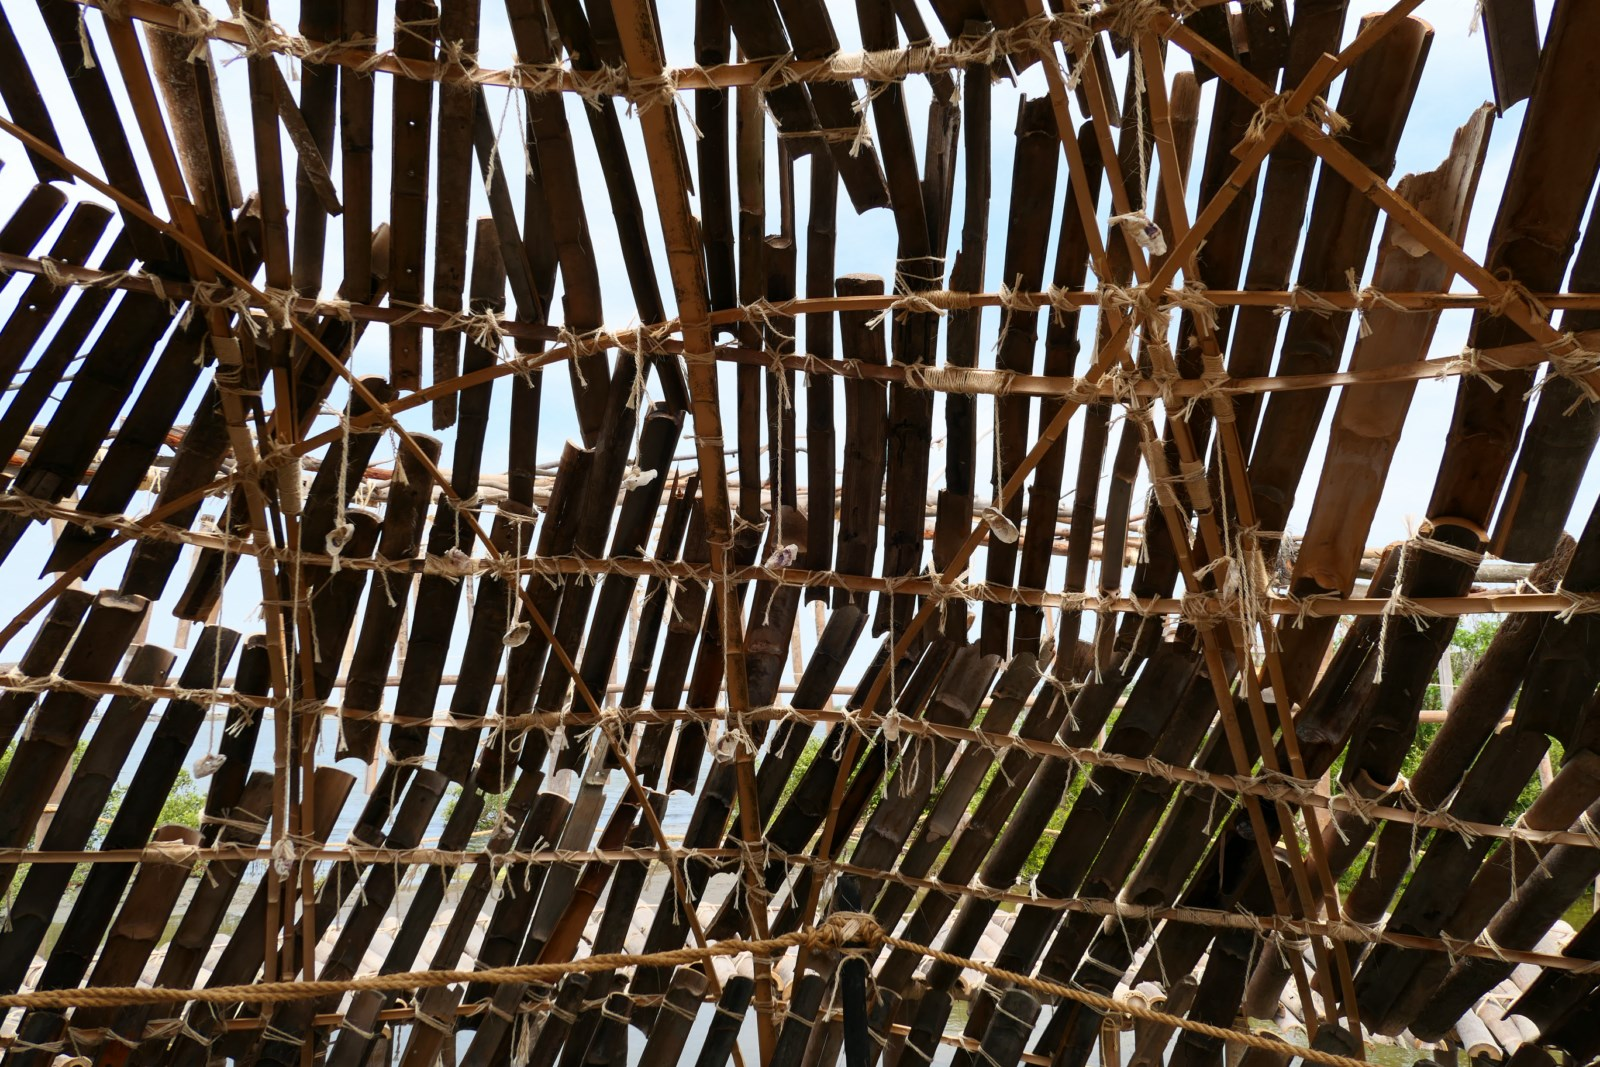 Chenglong shelter 16 [1600x1200]